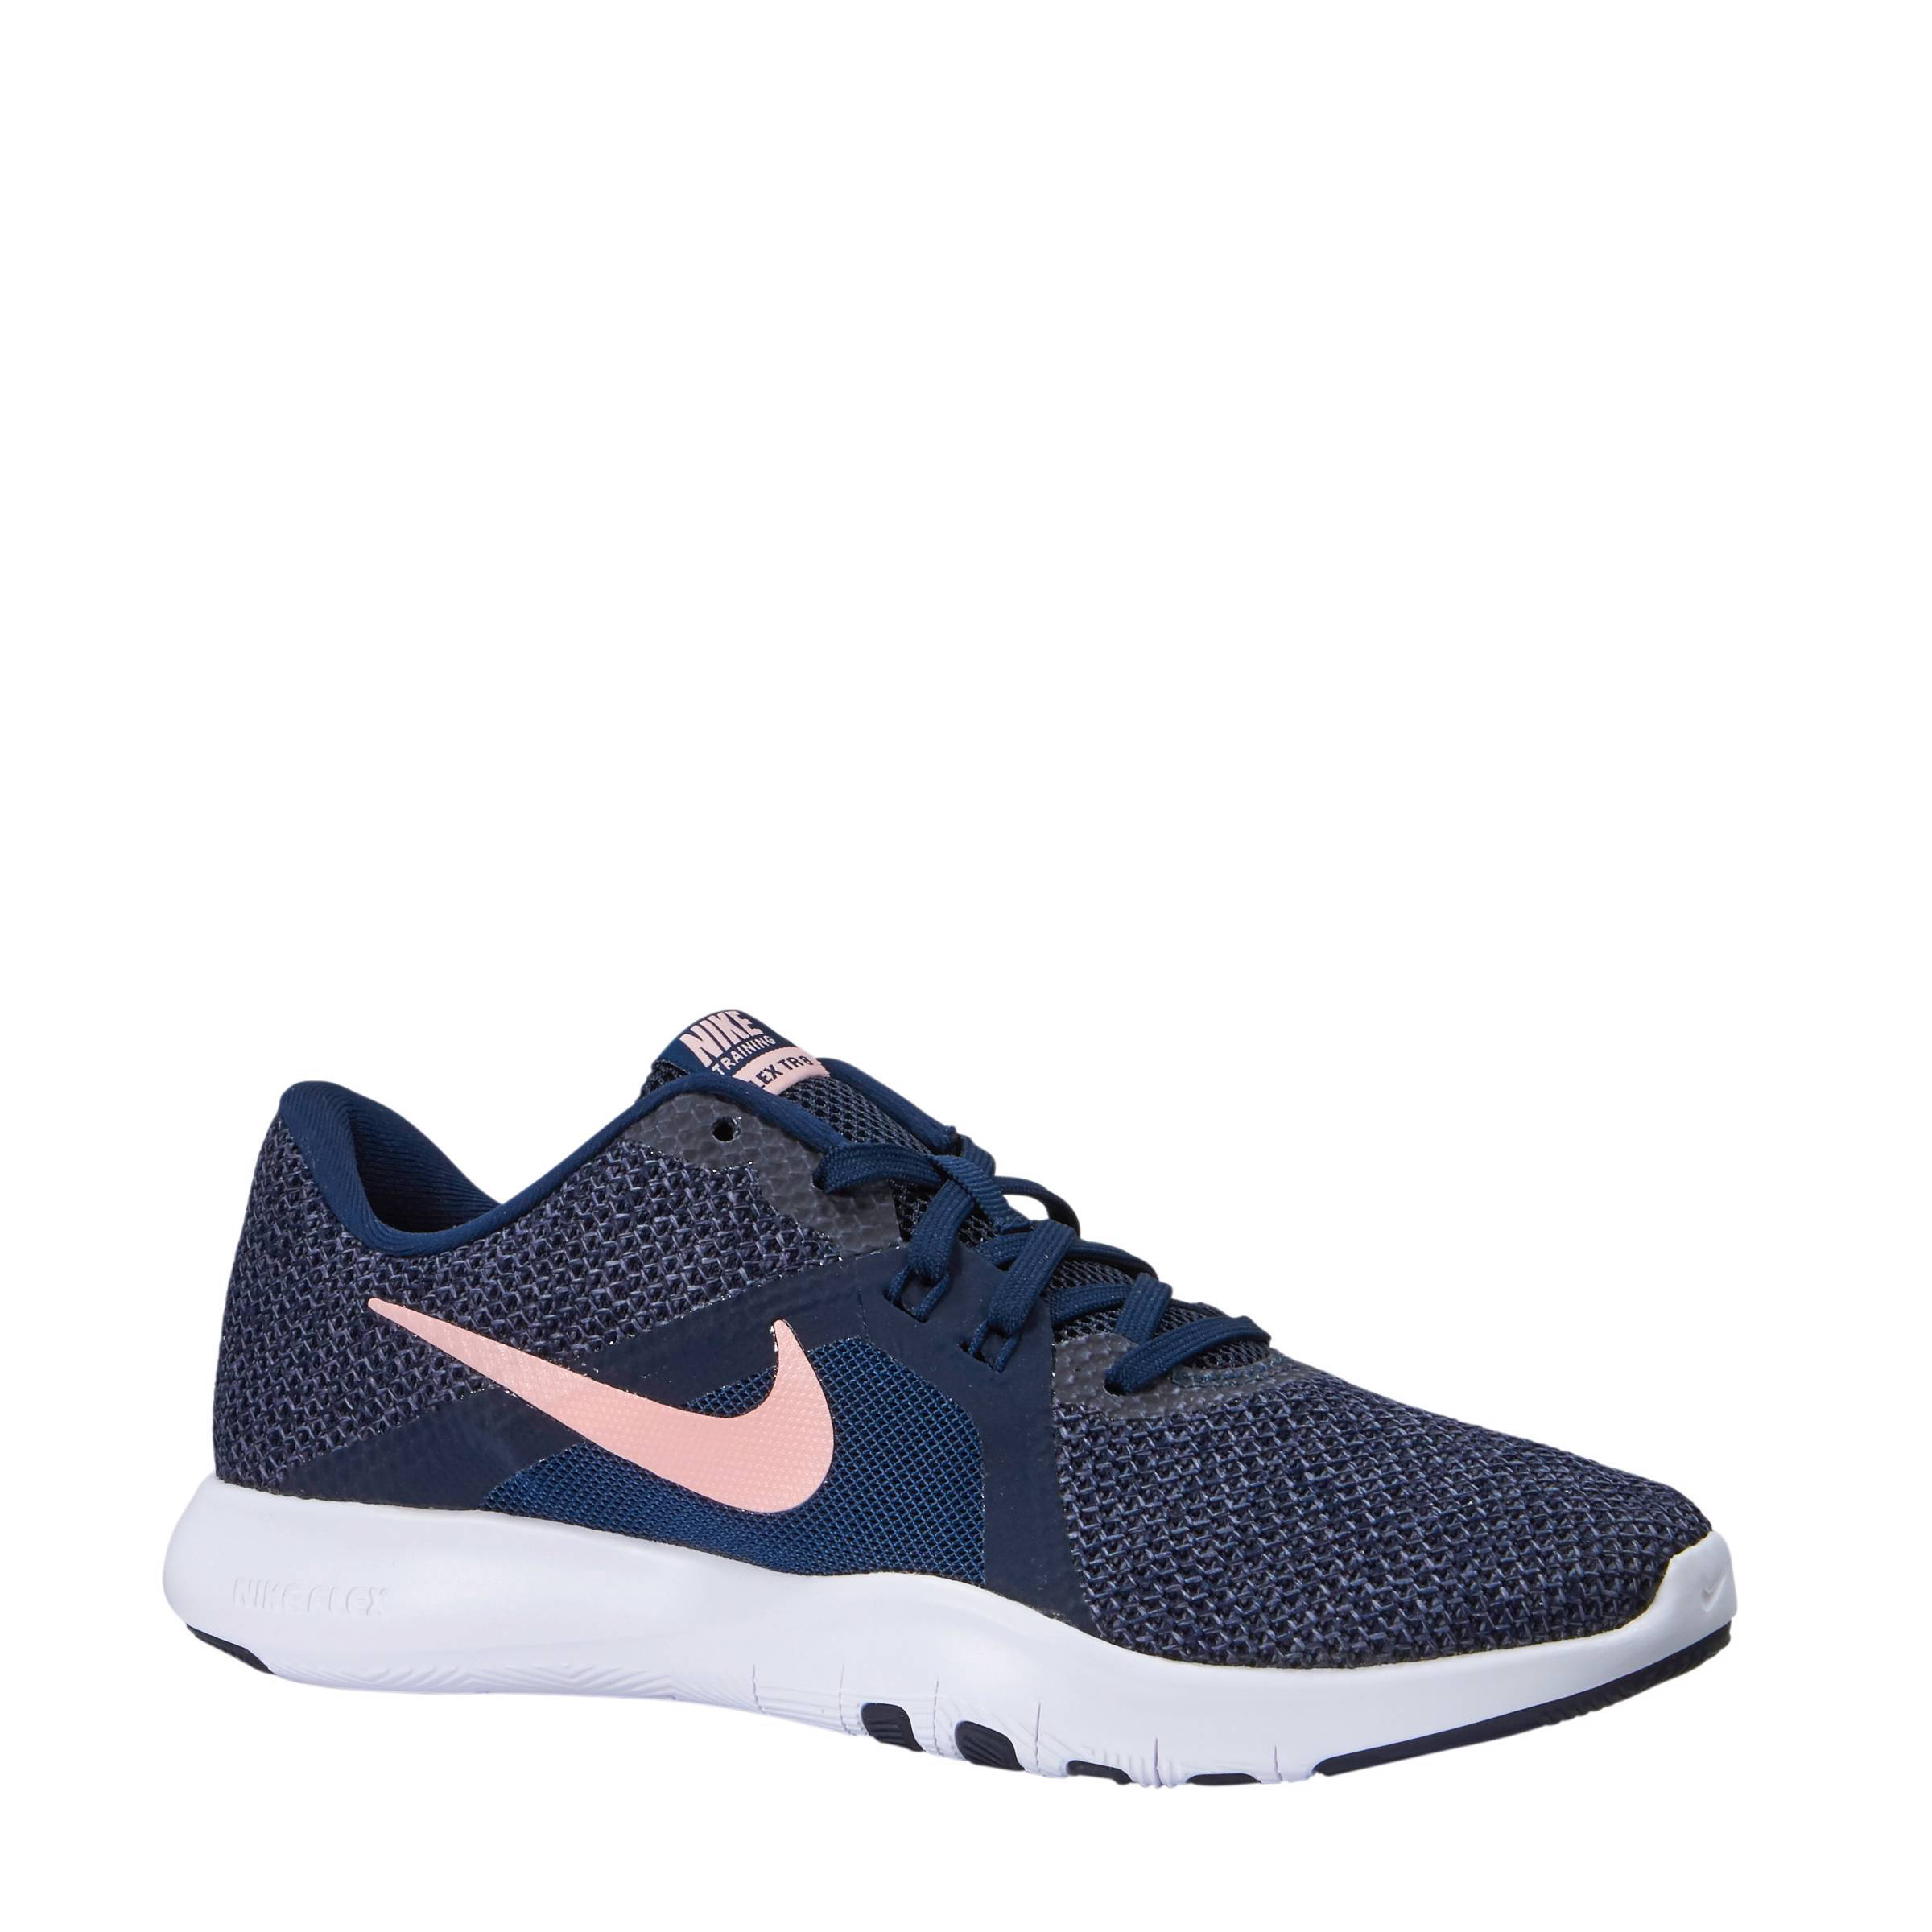 Donkerblauwroze schoenen Flex fitness Trainer 8 Nike 1qZ6X